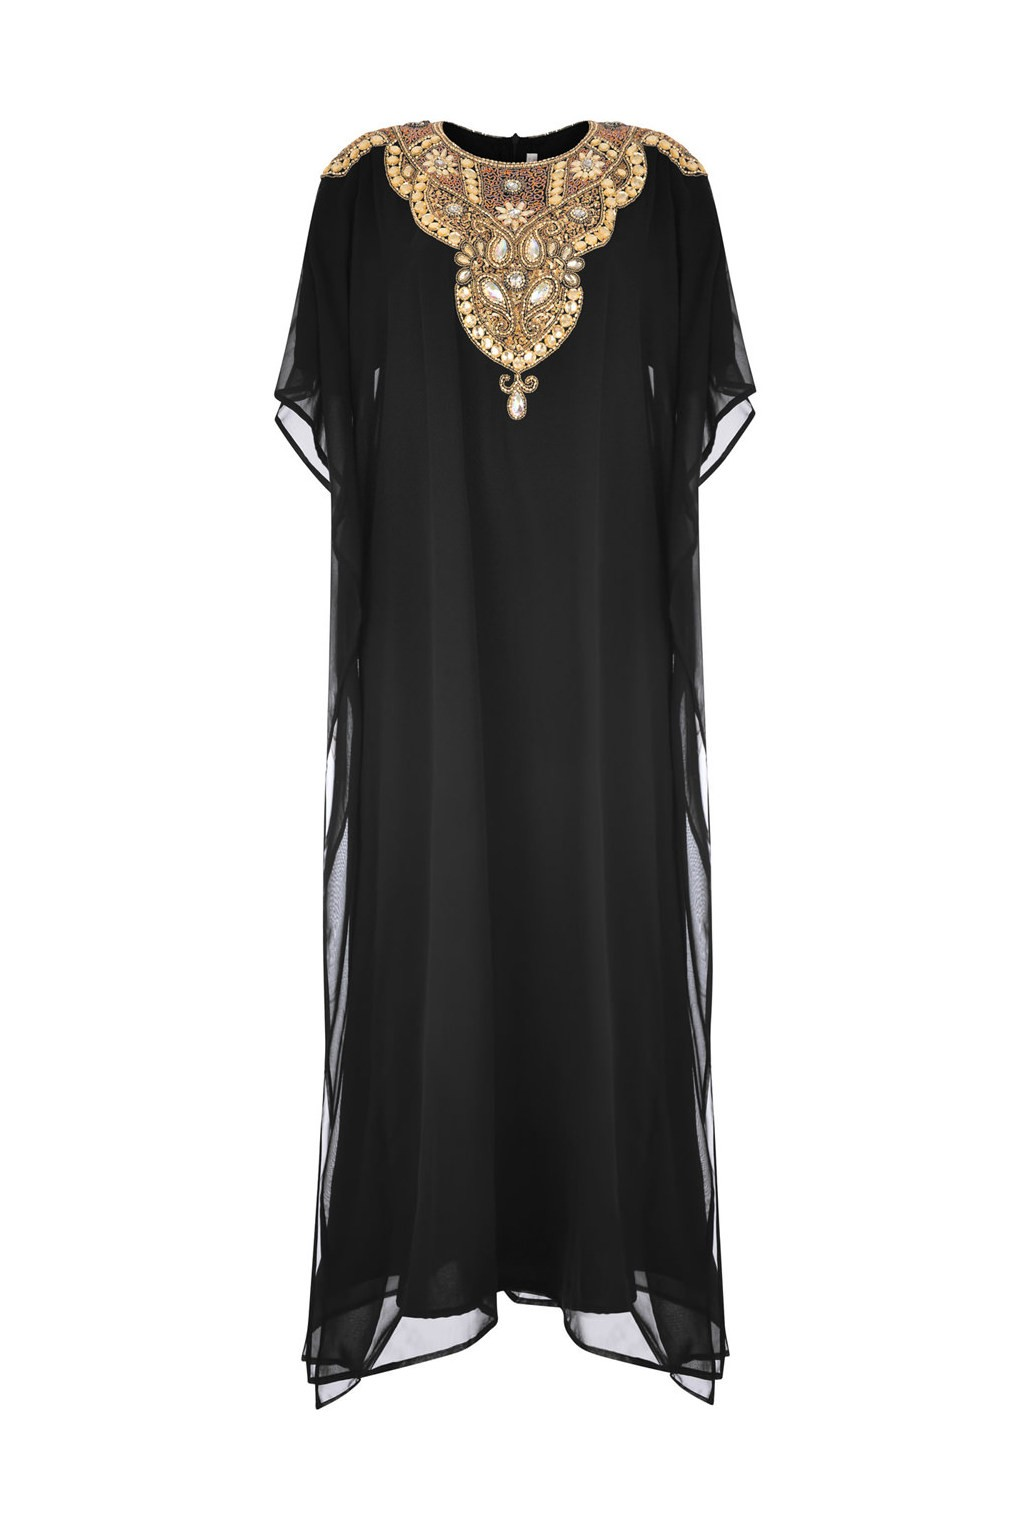 Nafisa Dubai Kaftan Dress Image